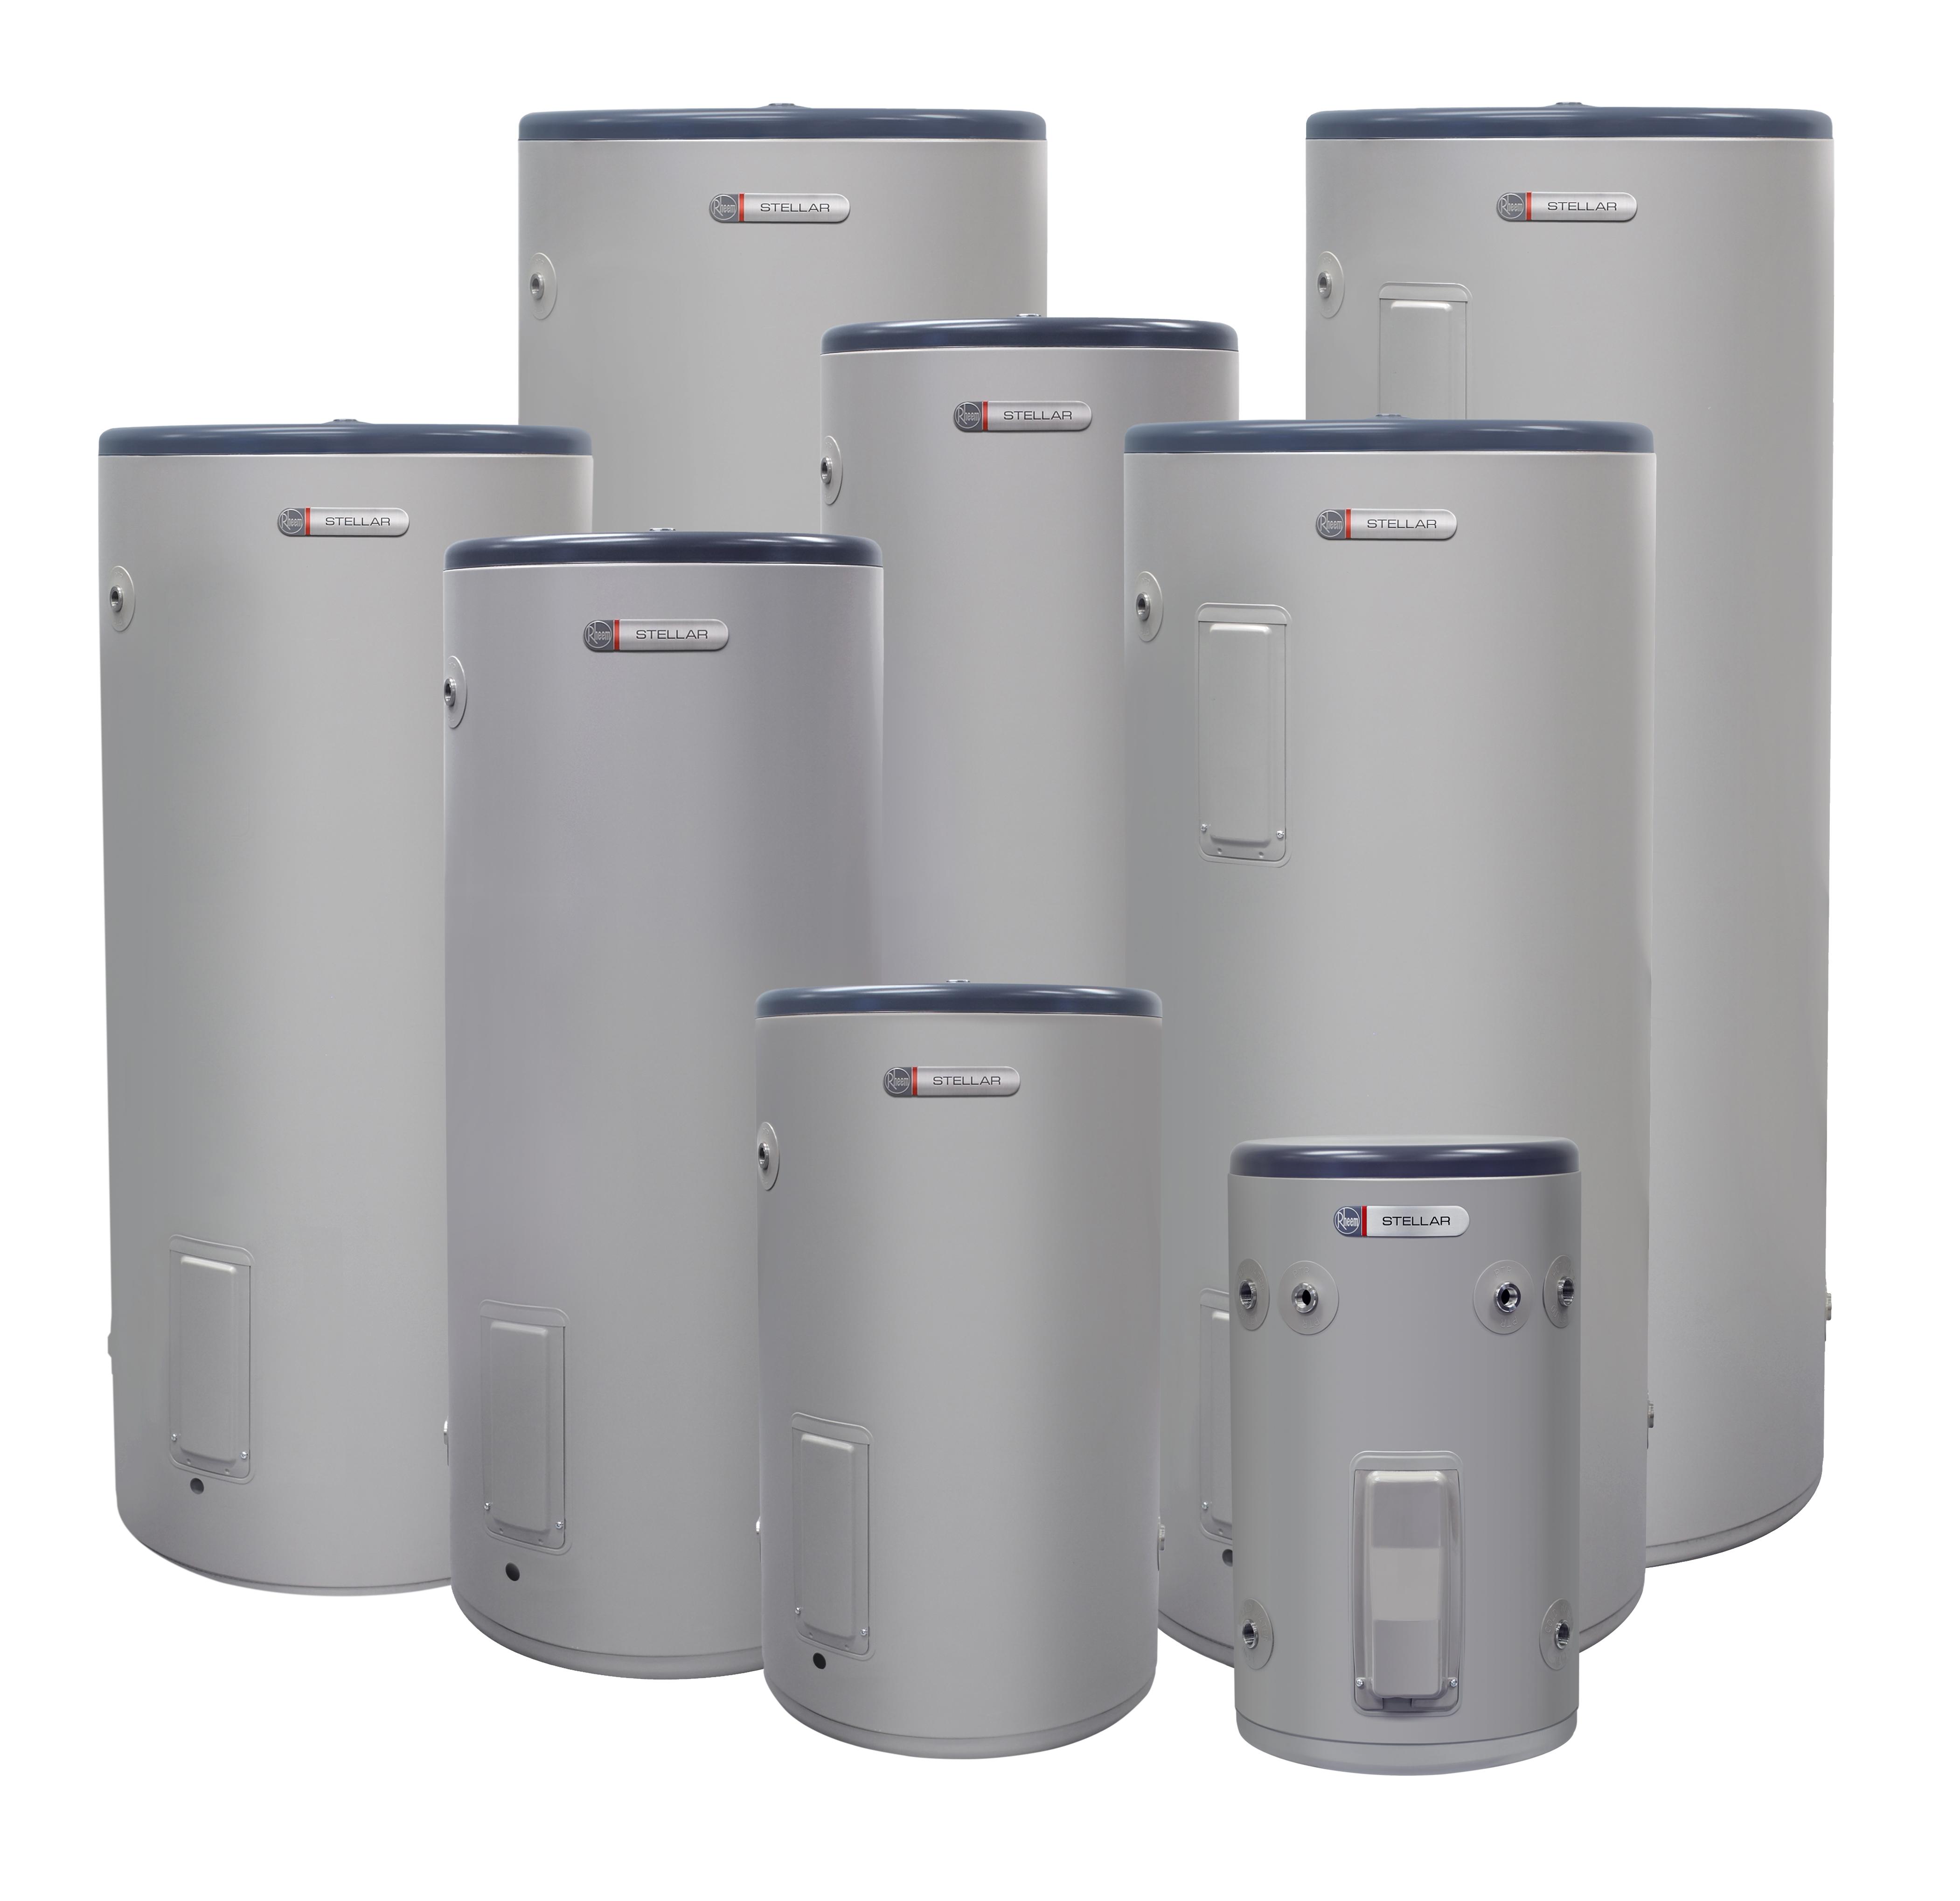 Rheem hot water heater dating